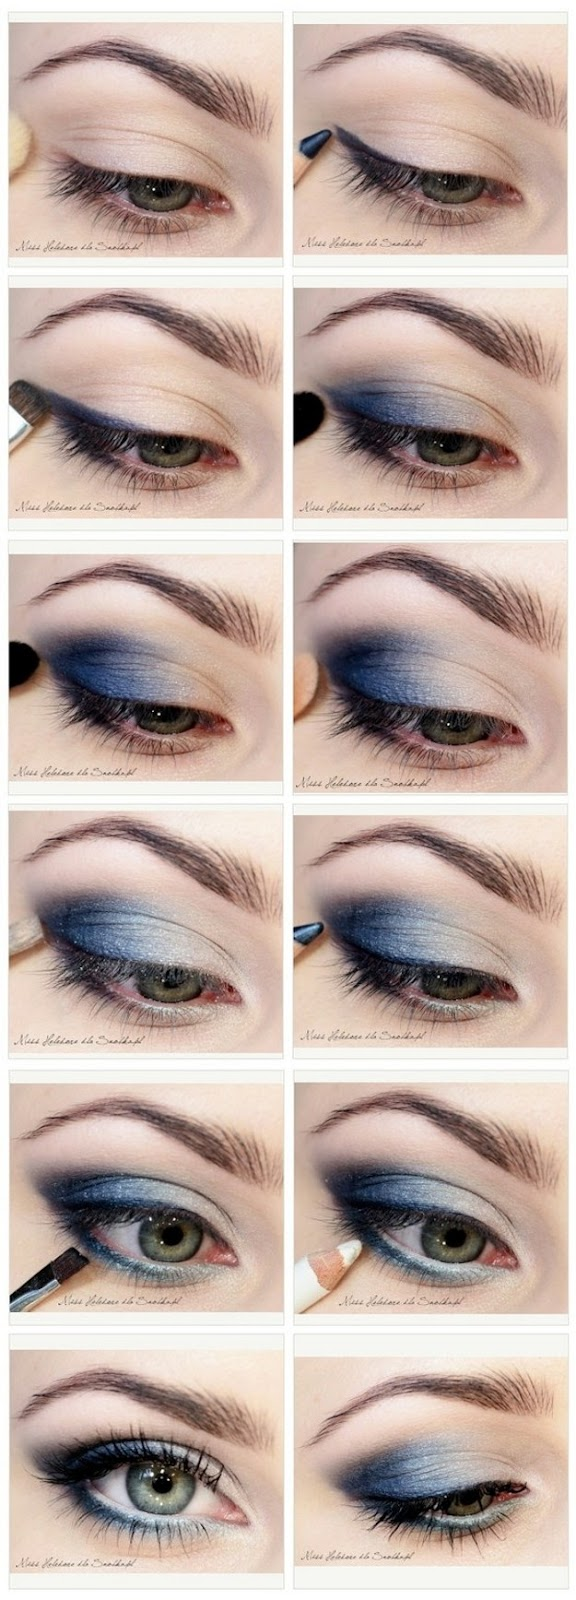 How to Do Blue Smokey Eyes | Graduation Makeup Tutorials by http://www.makeuptutorials.com/makeup-tutorials-graduation-beauty-ideas